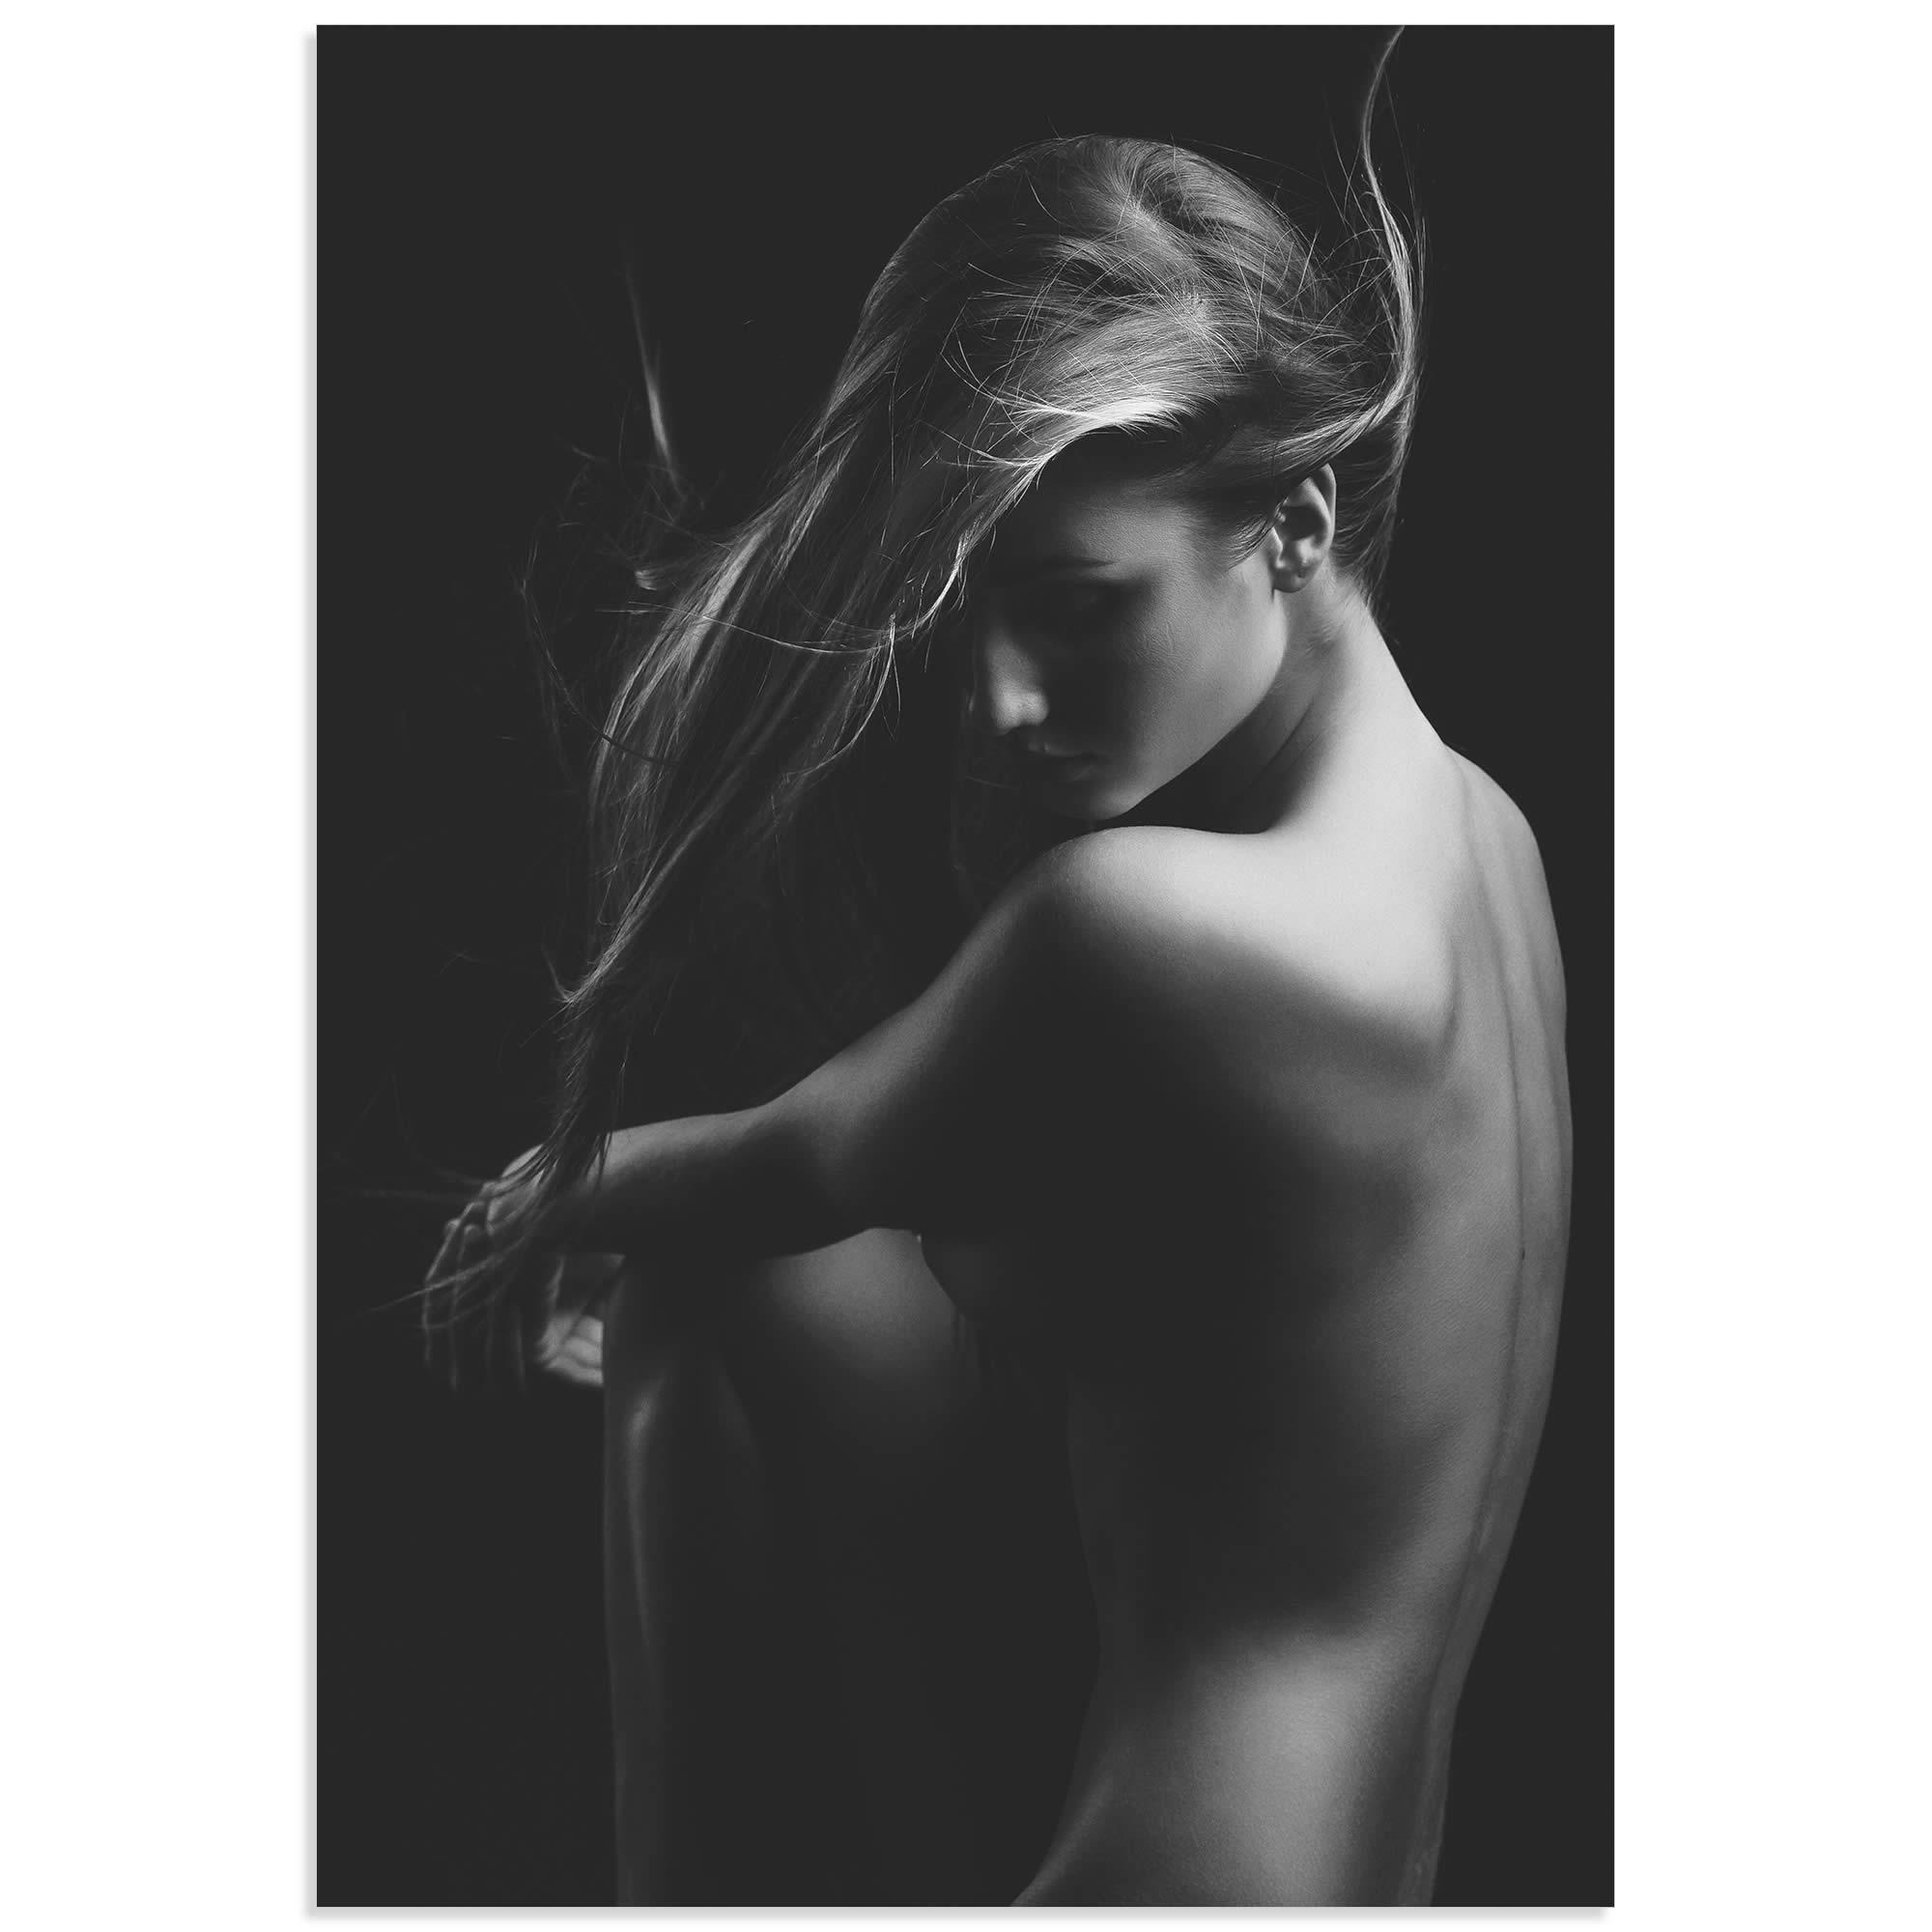 Sensual Beauty by Martin Krystynek - Model Photography on Metal or Acrylic